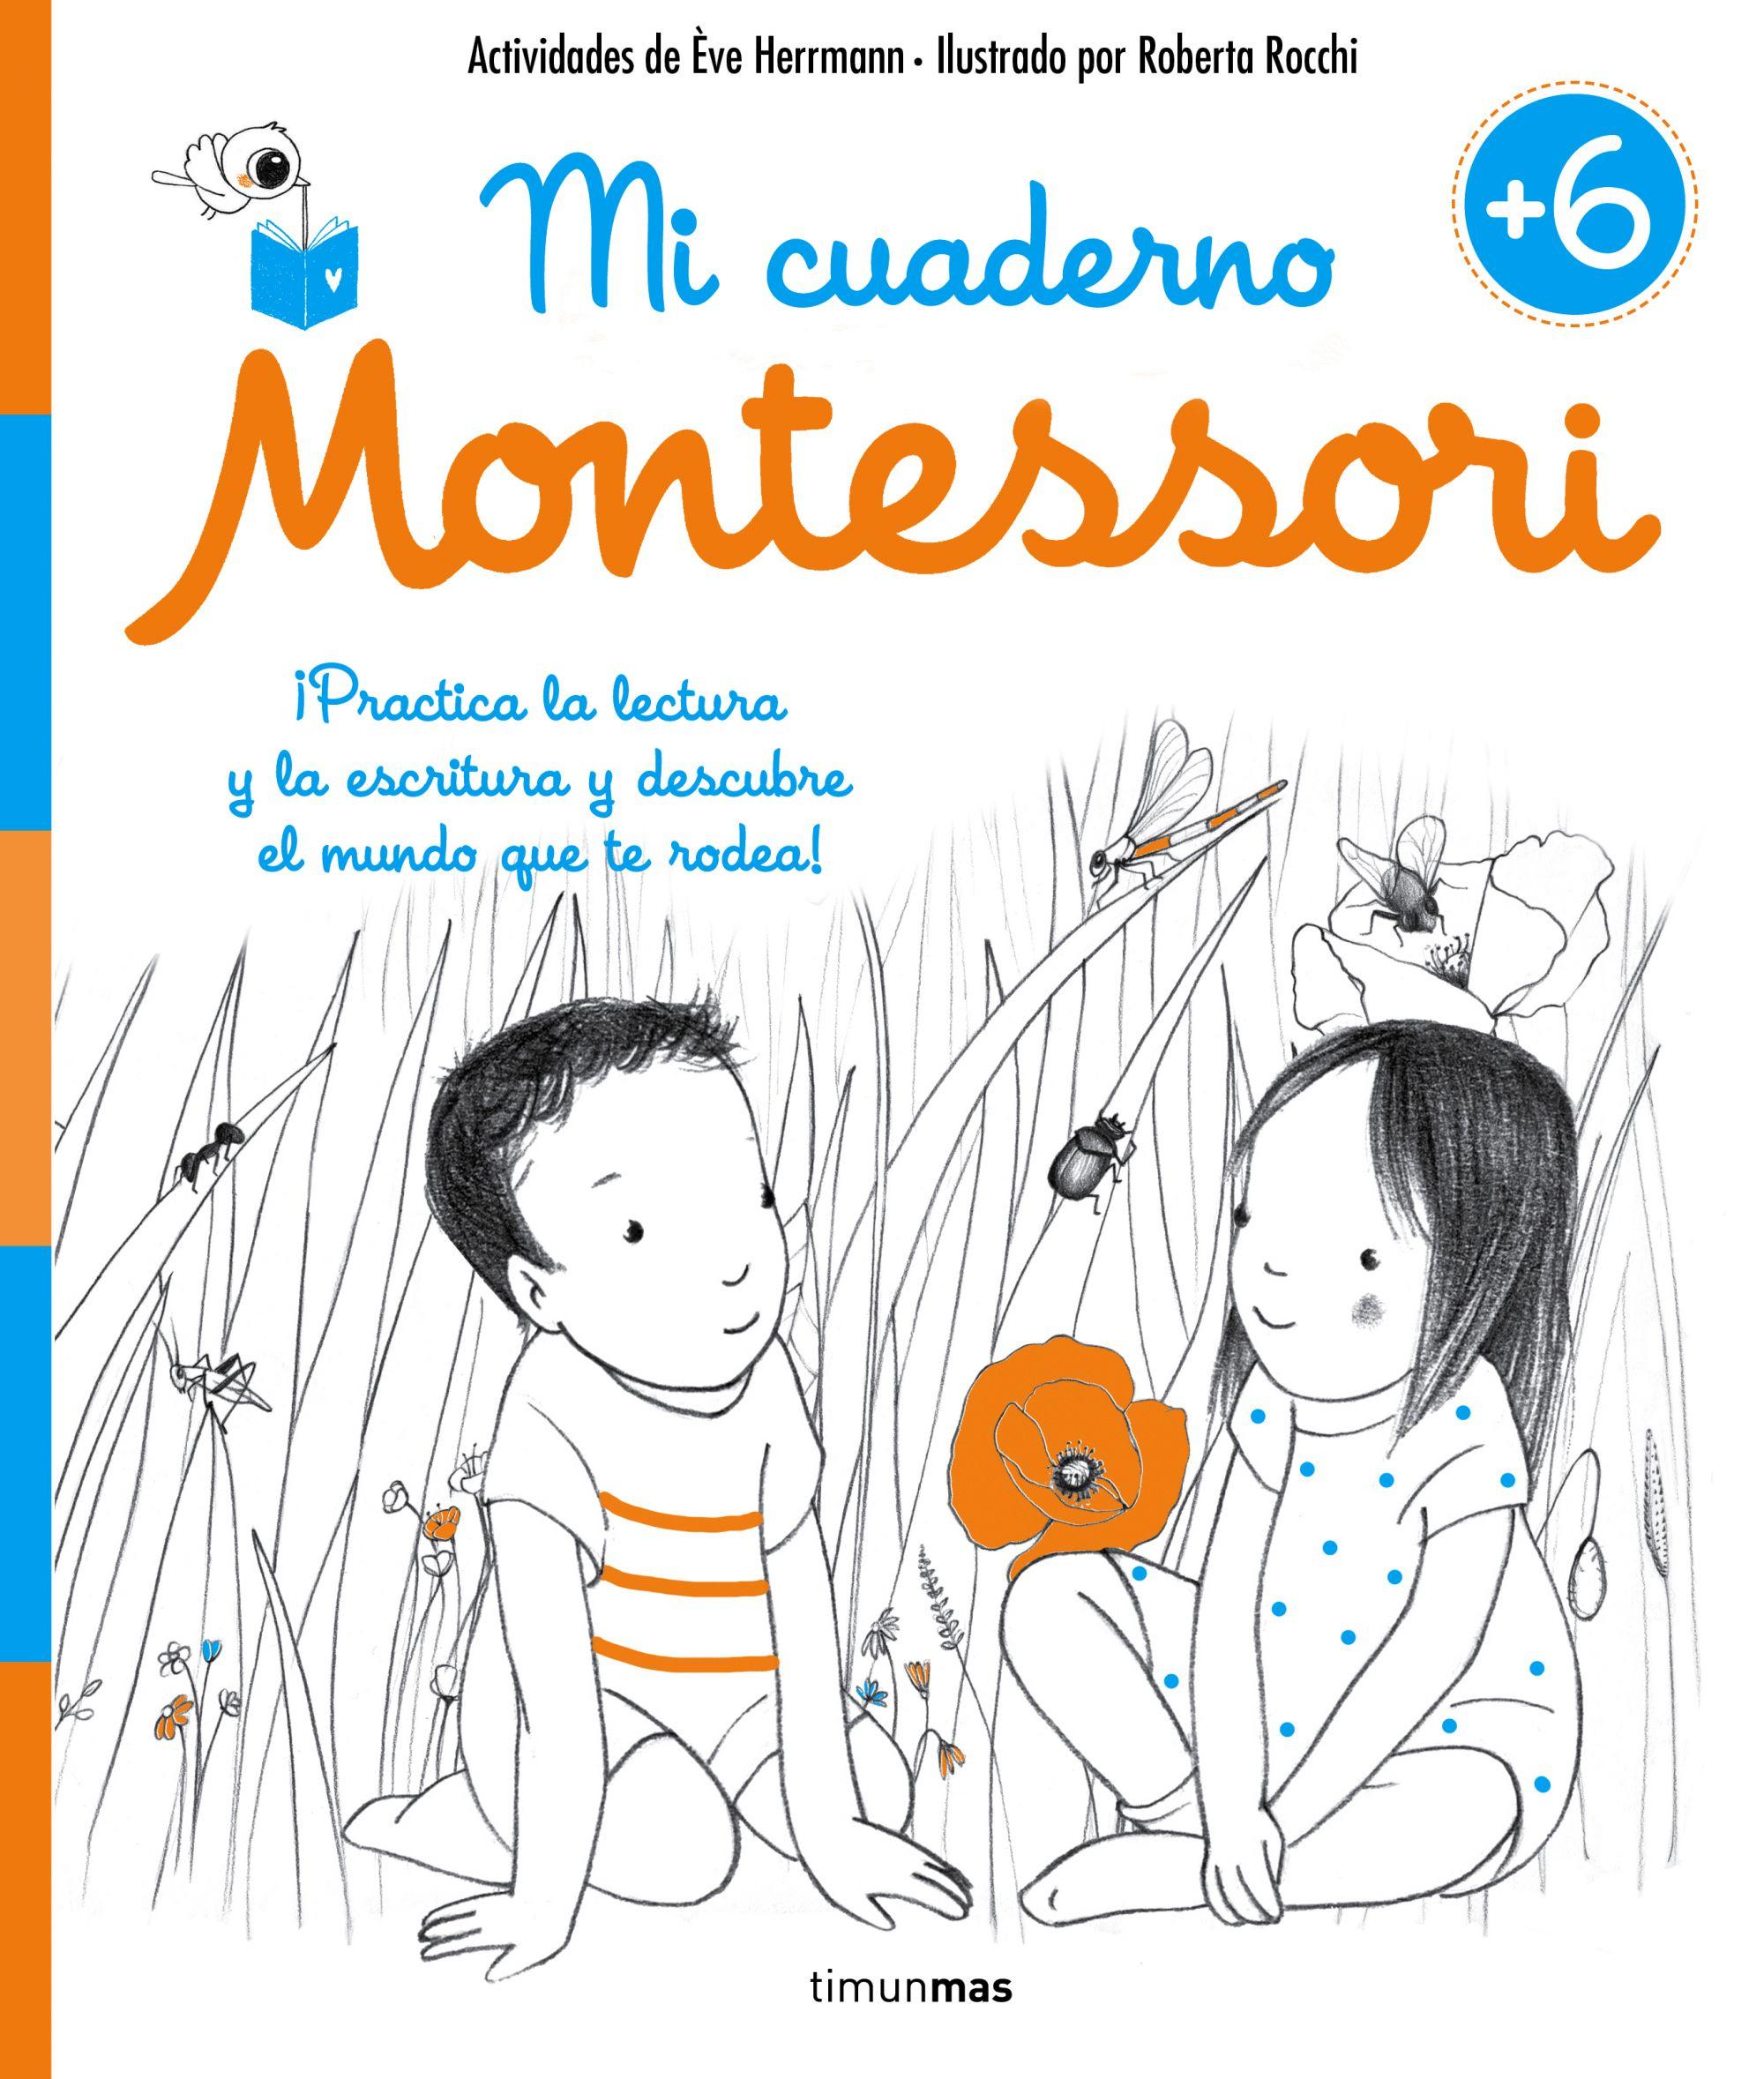 Mi Cuaderno Montessori +6 - Herrmann Eve